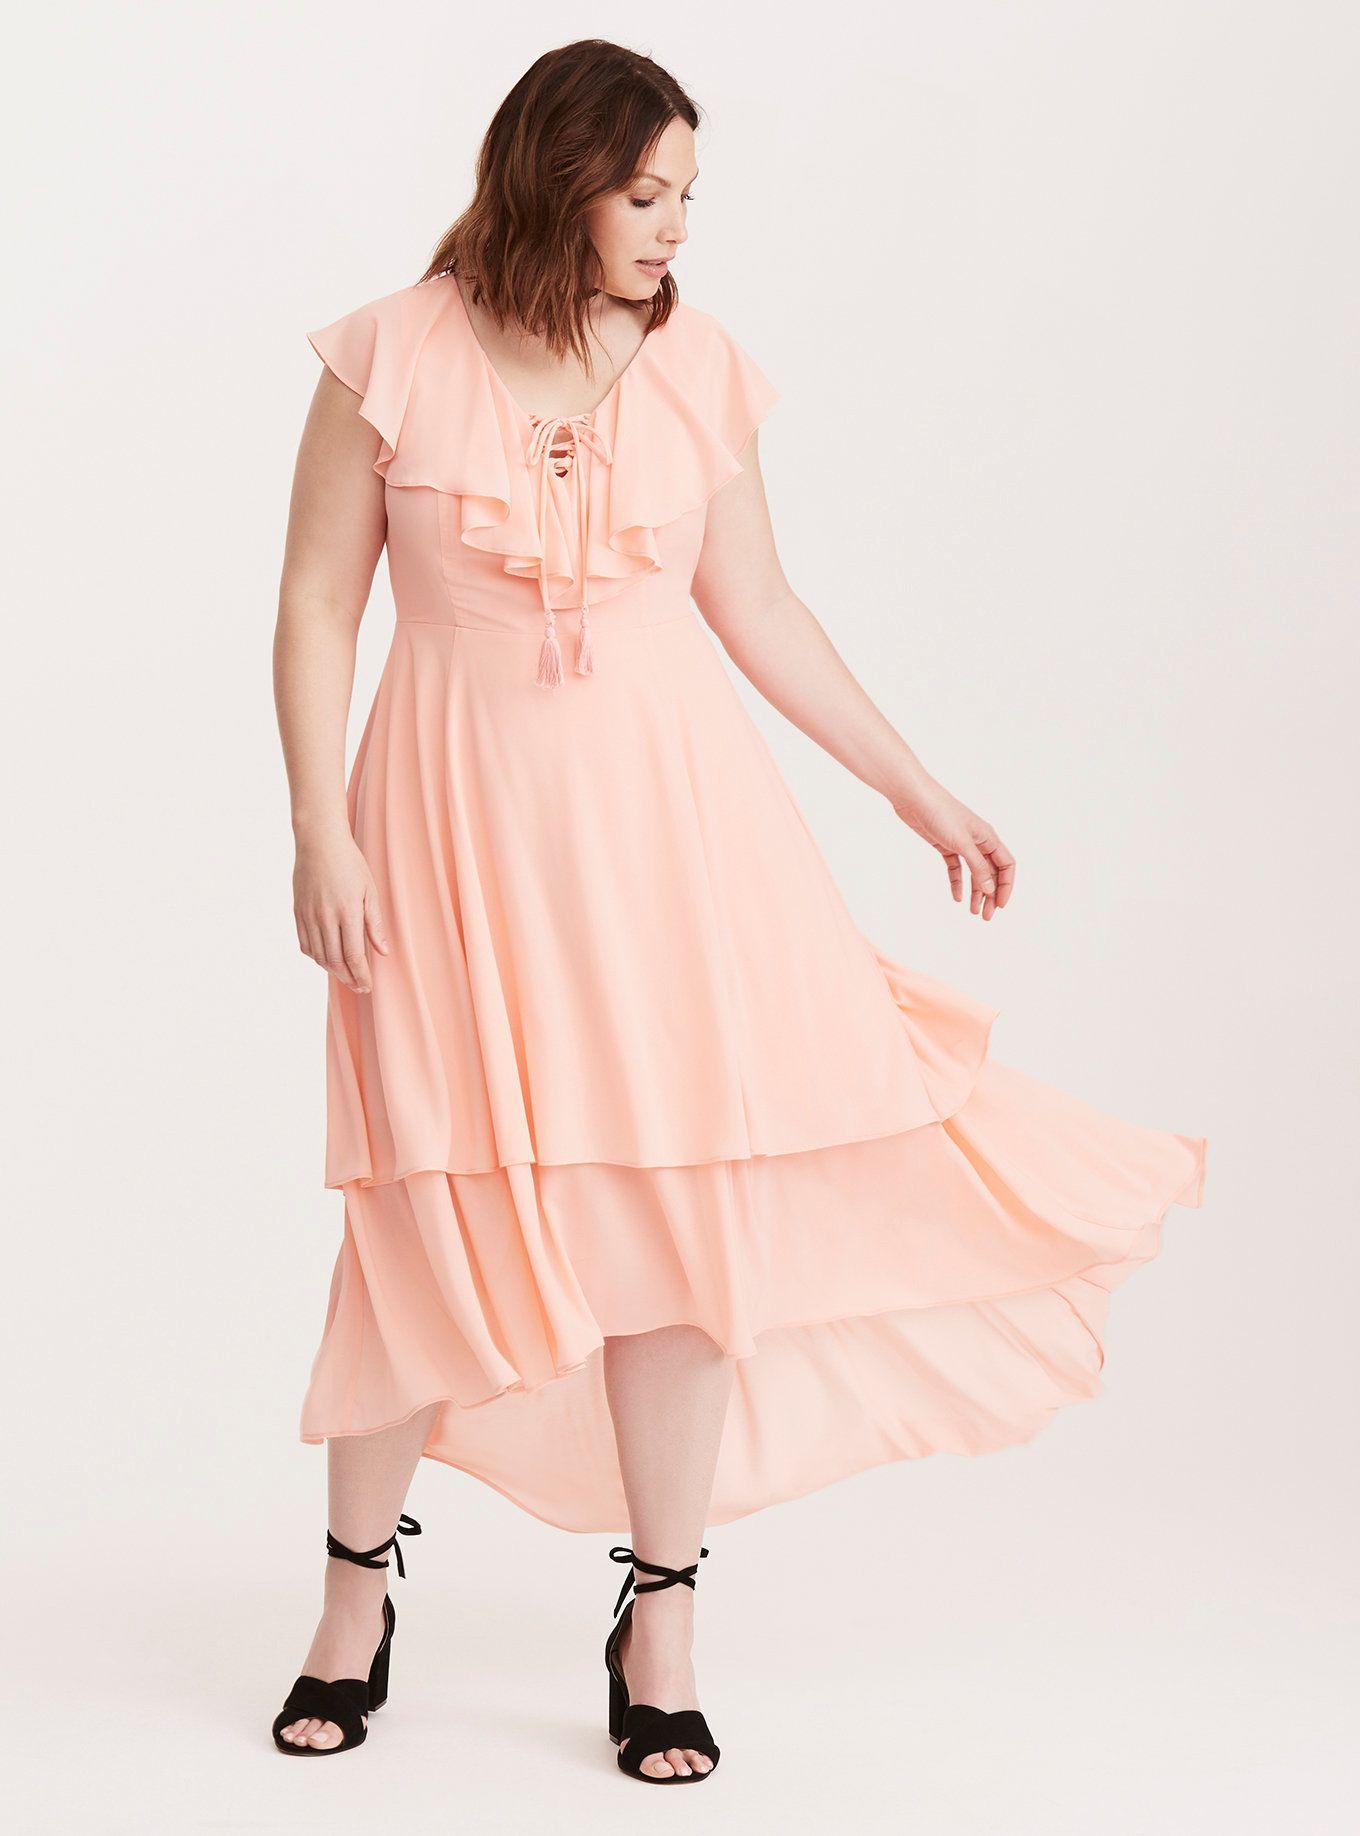 Torrid Insider Lace Up Ruffle Maxi Dress Lace maxi dress